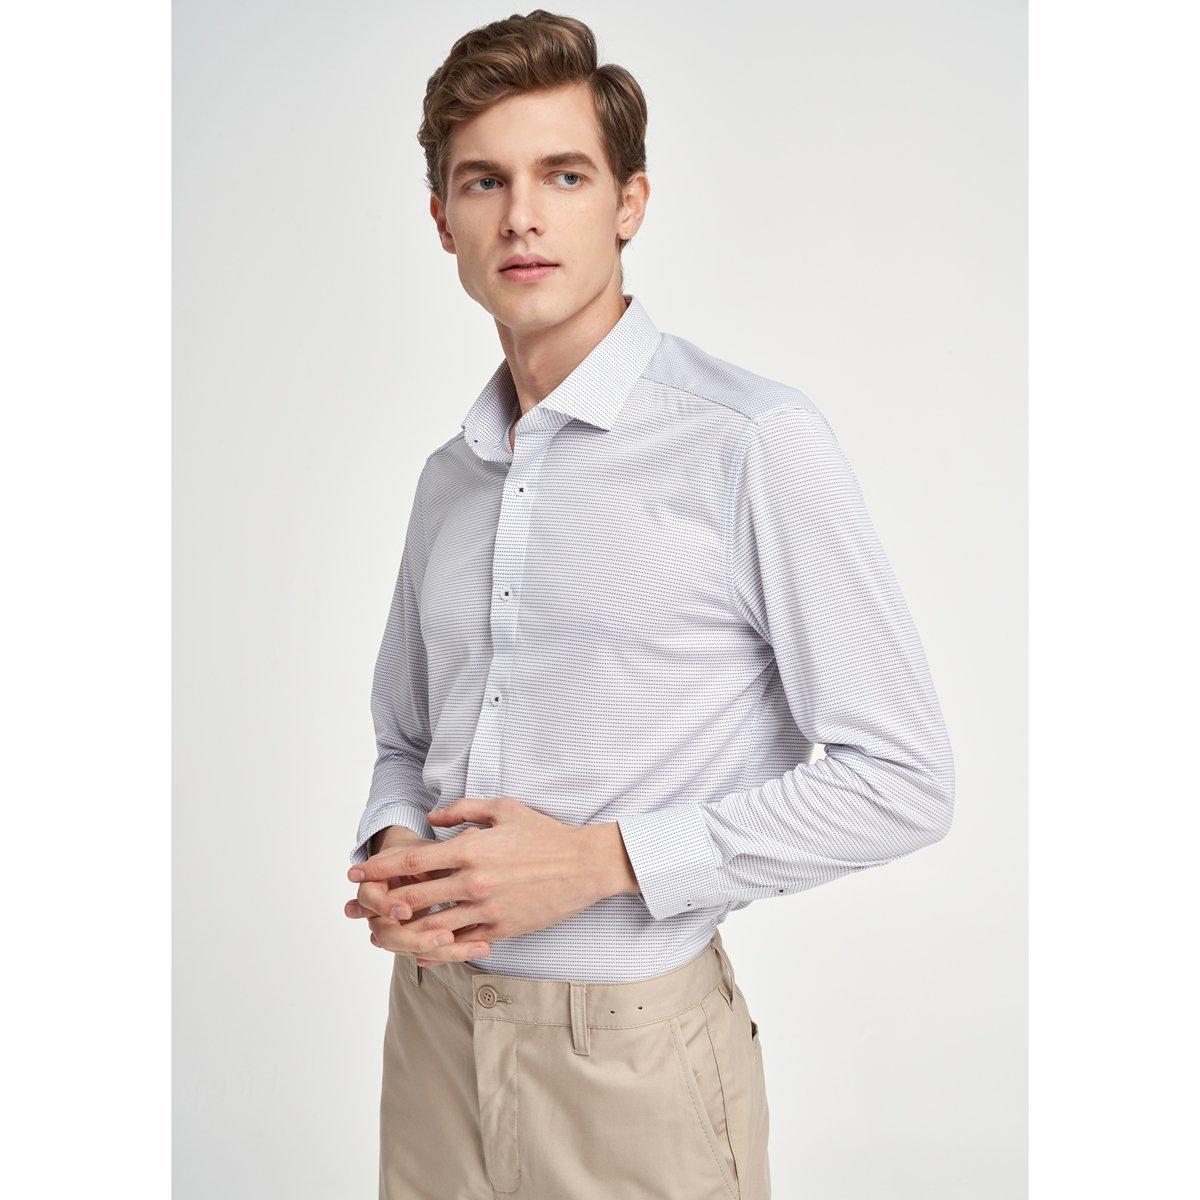 MEN'S LONG SHIRT(grey)